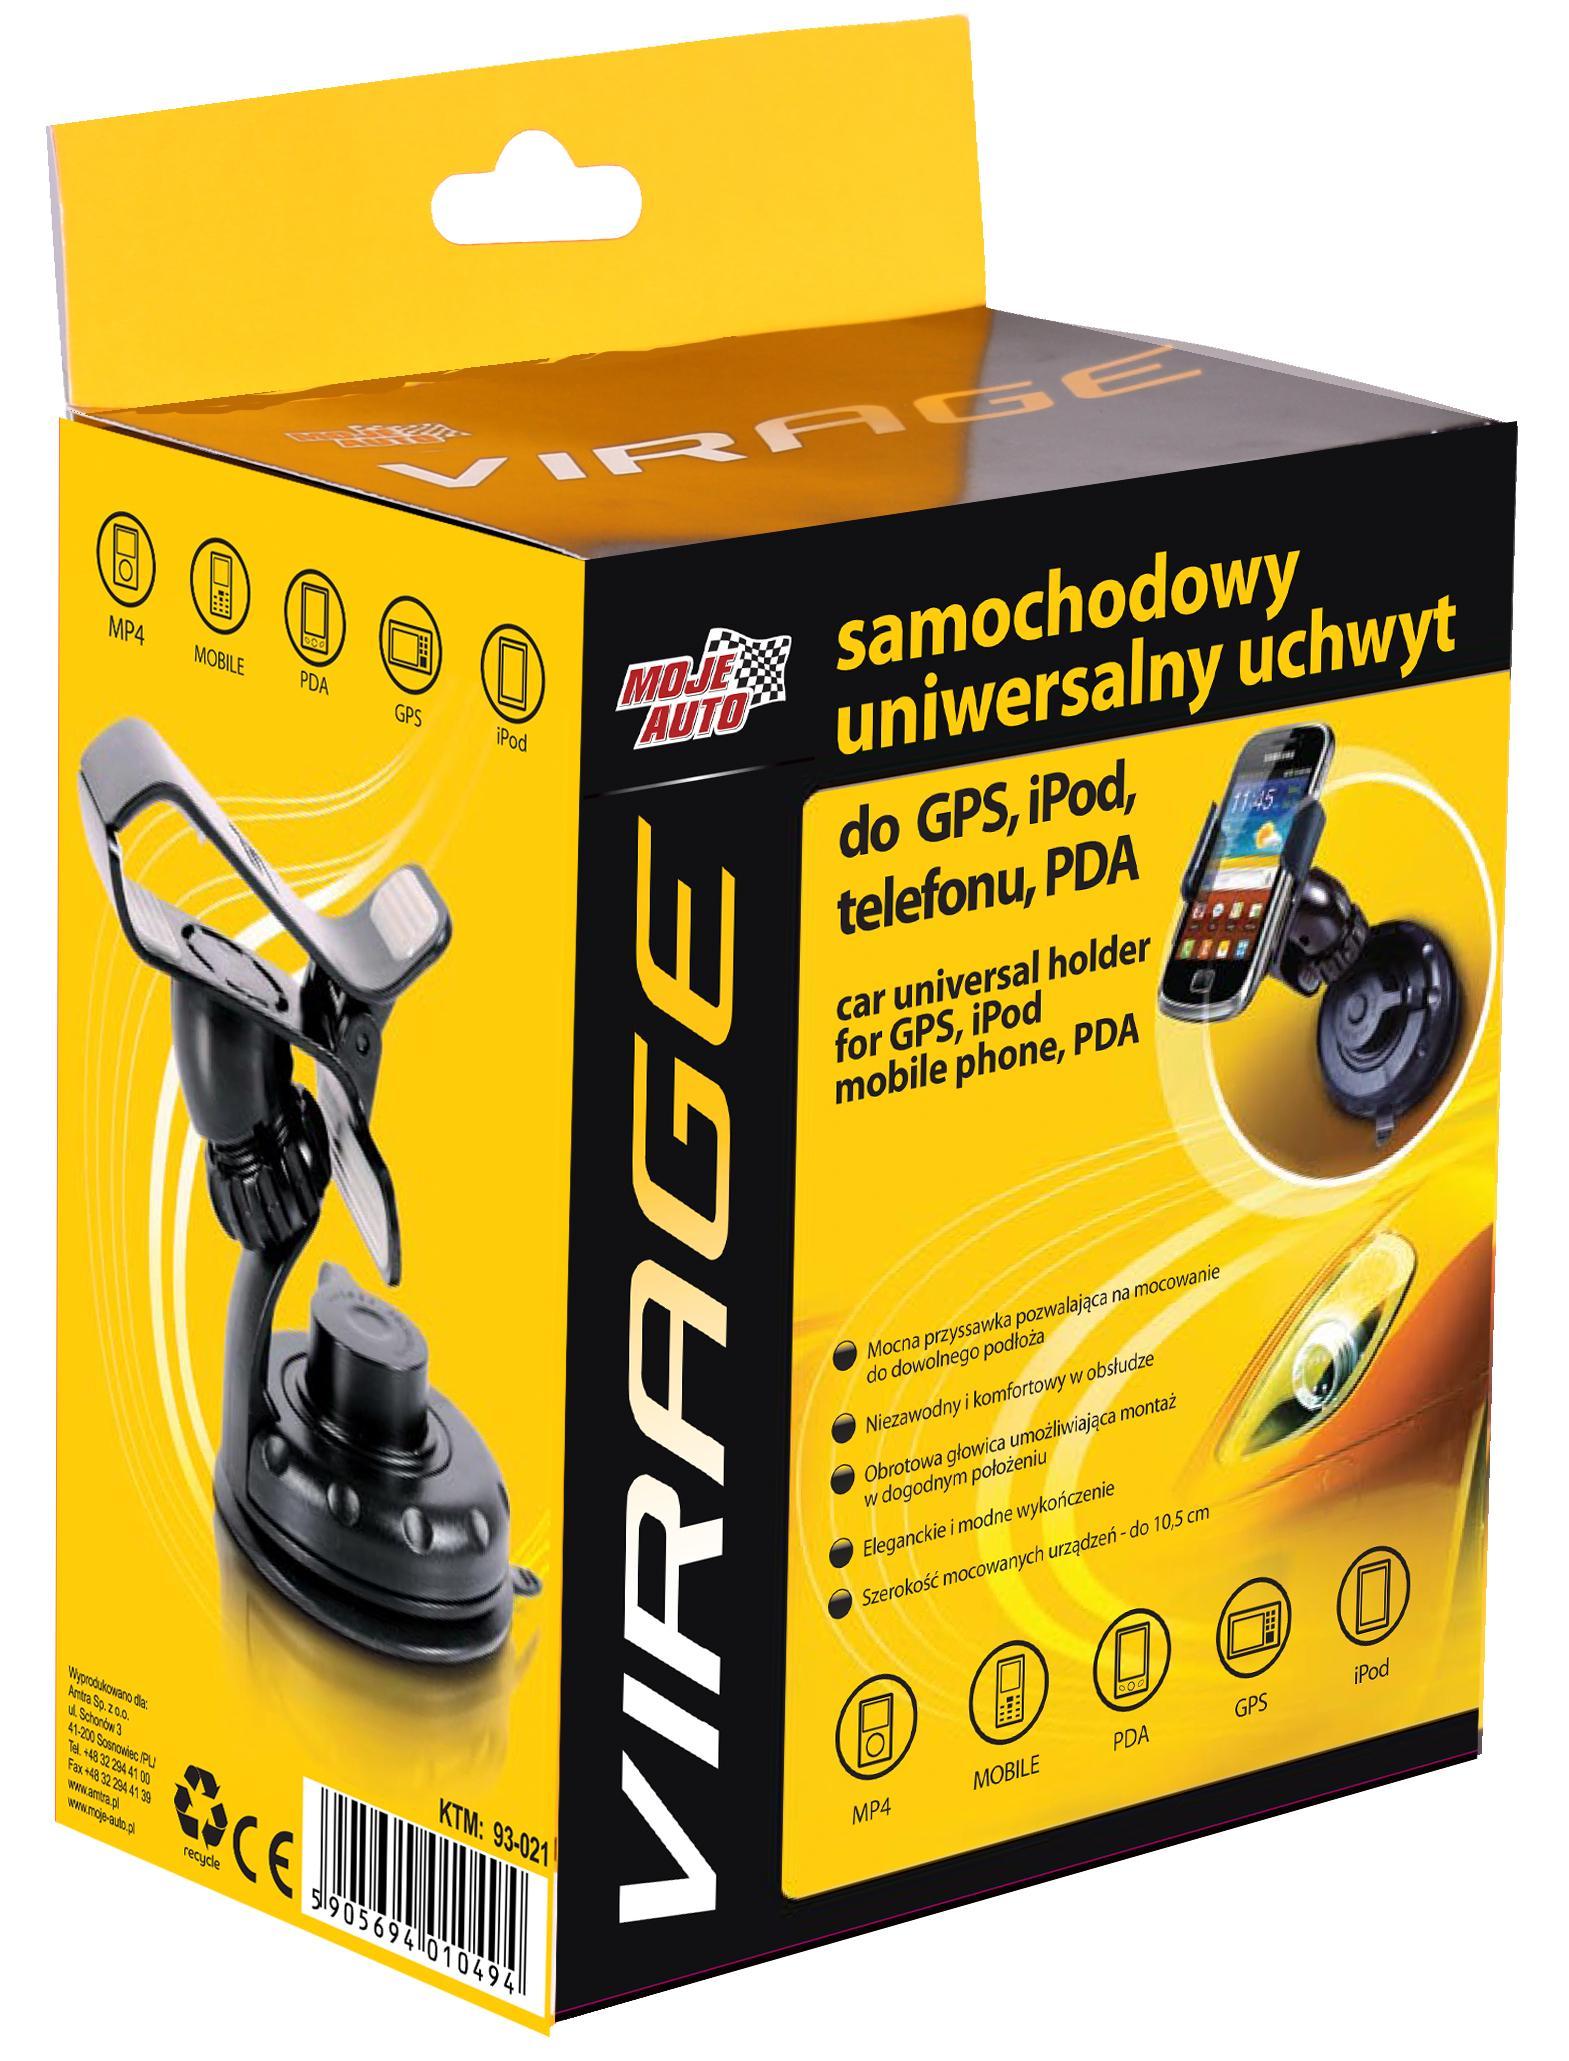 Mobile phone holders VIRAGE 93-021 5905694010494